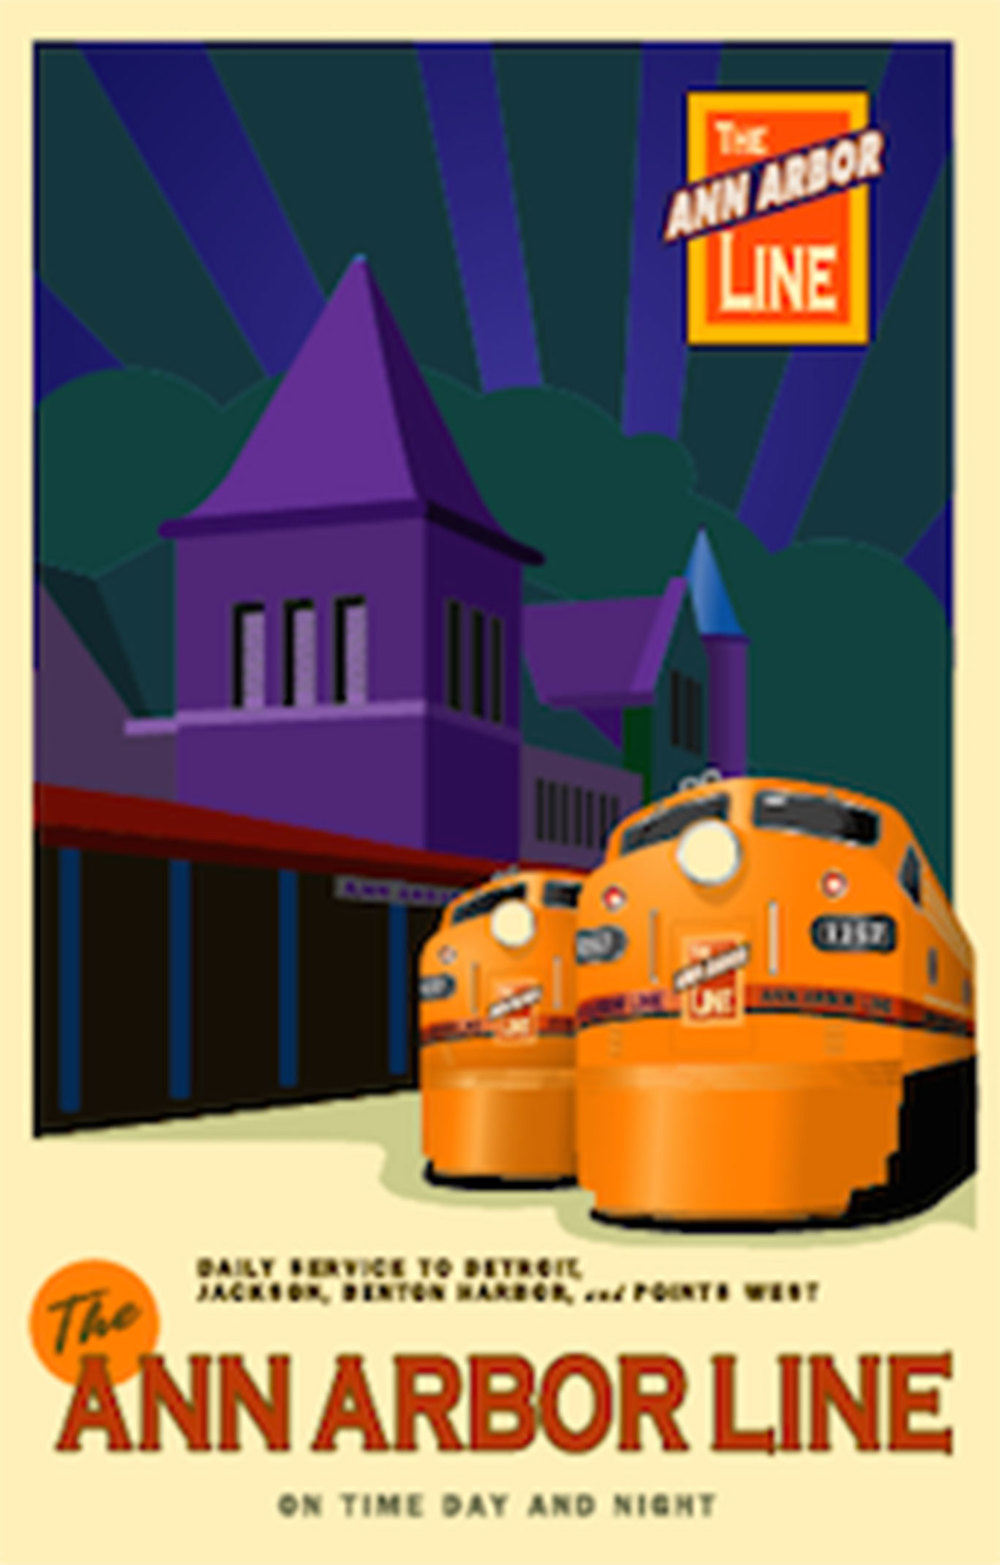 Ann Arbor Line Railroad Poster